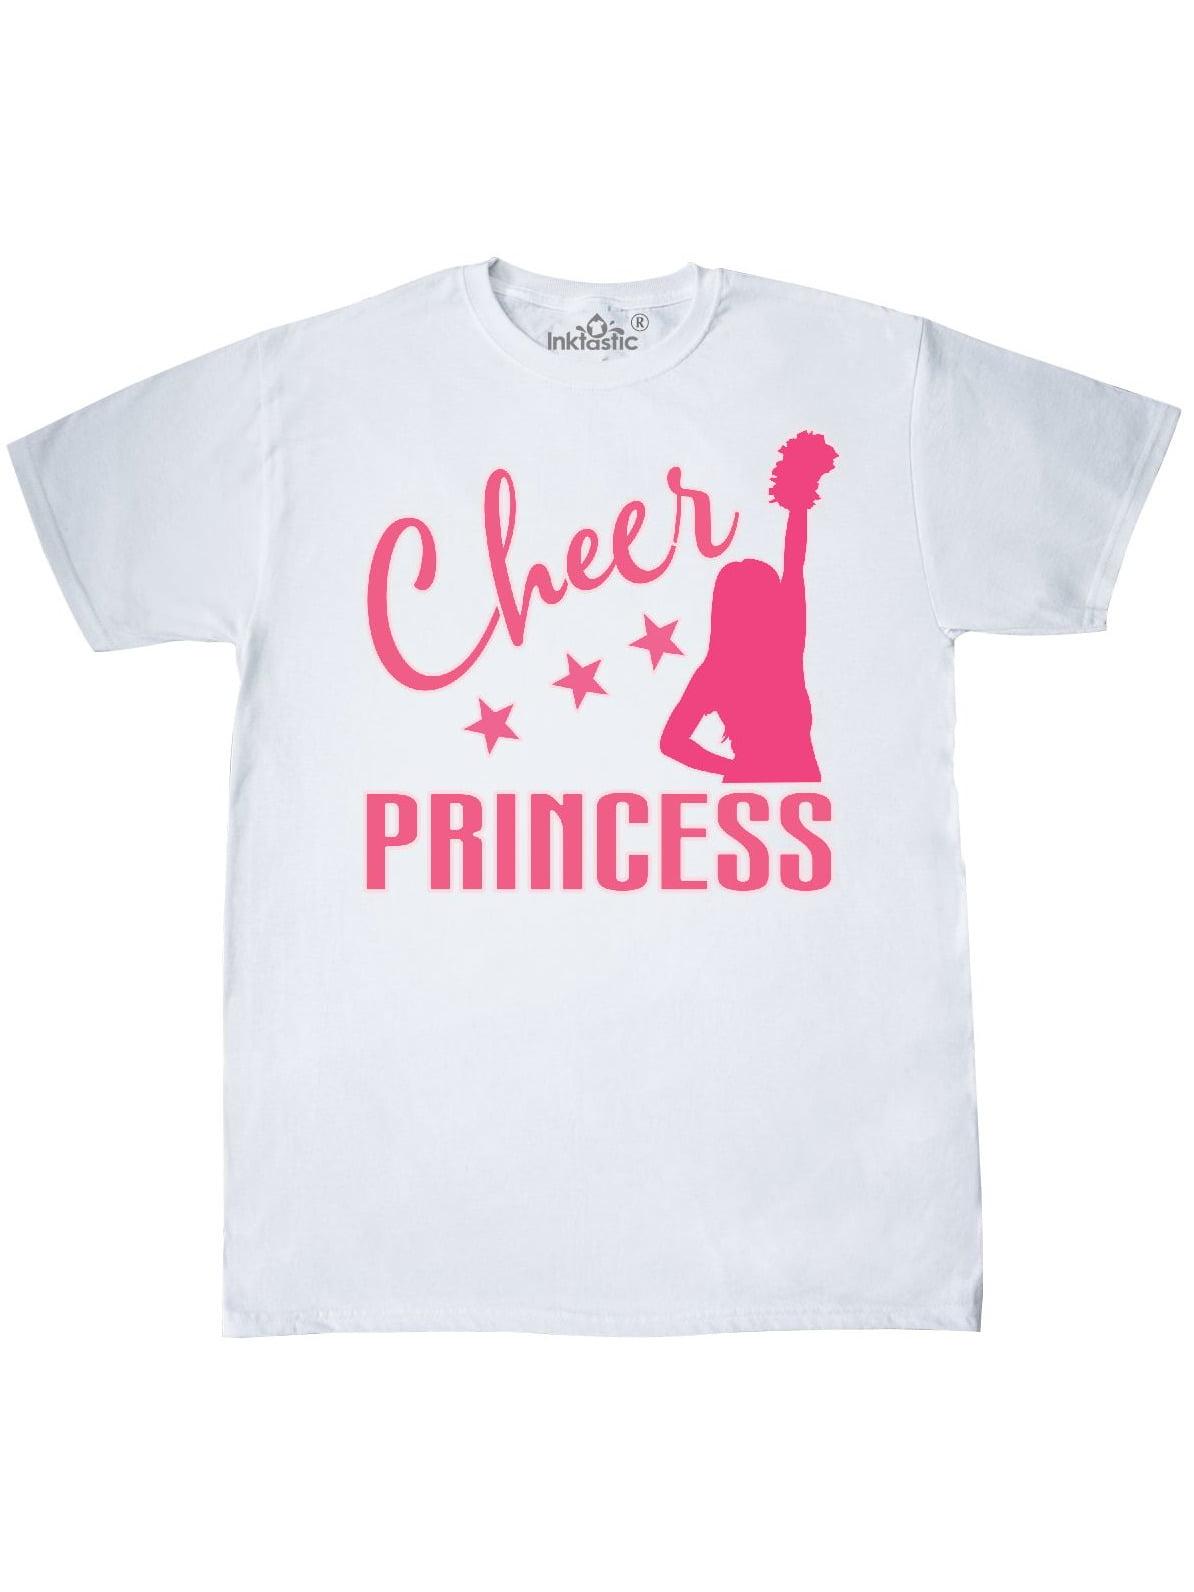 inktastic Cheer Princess Cheerleading Toddler T-Shirt